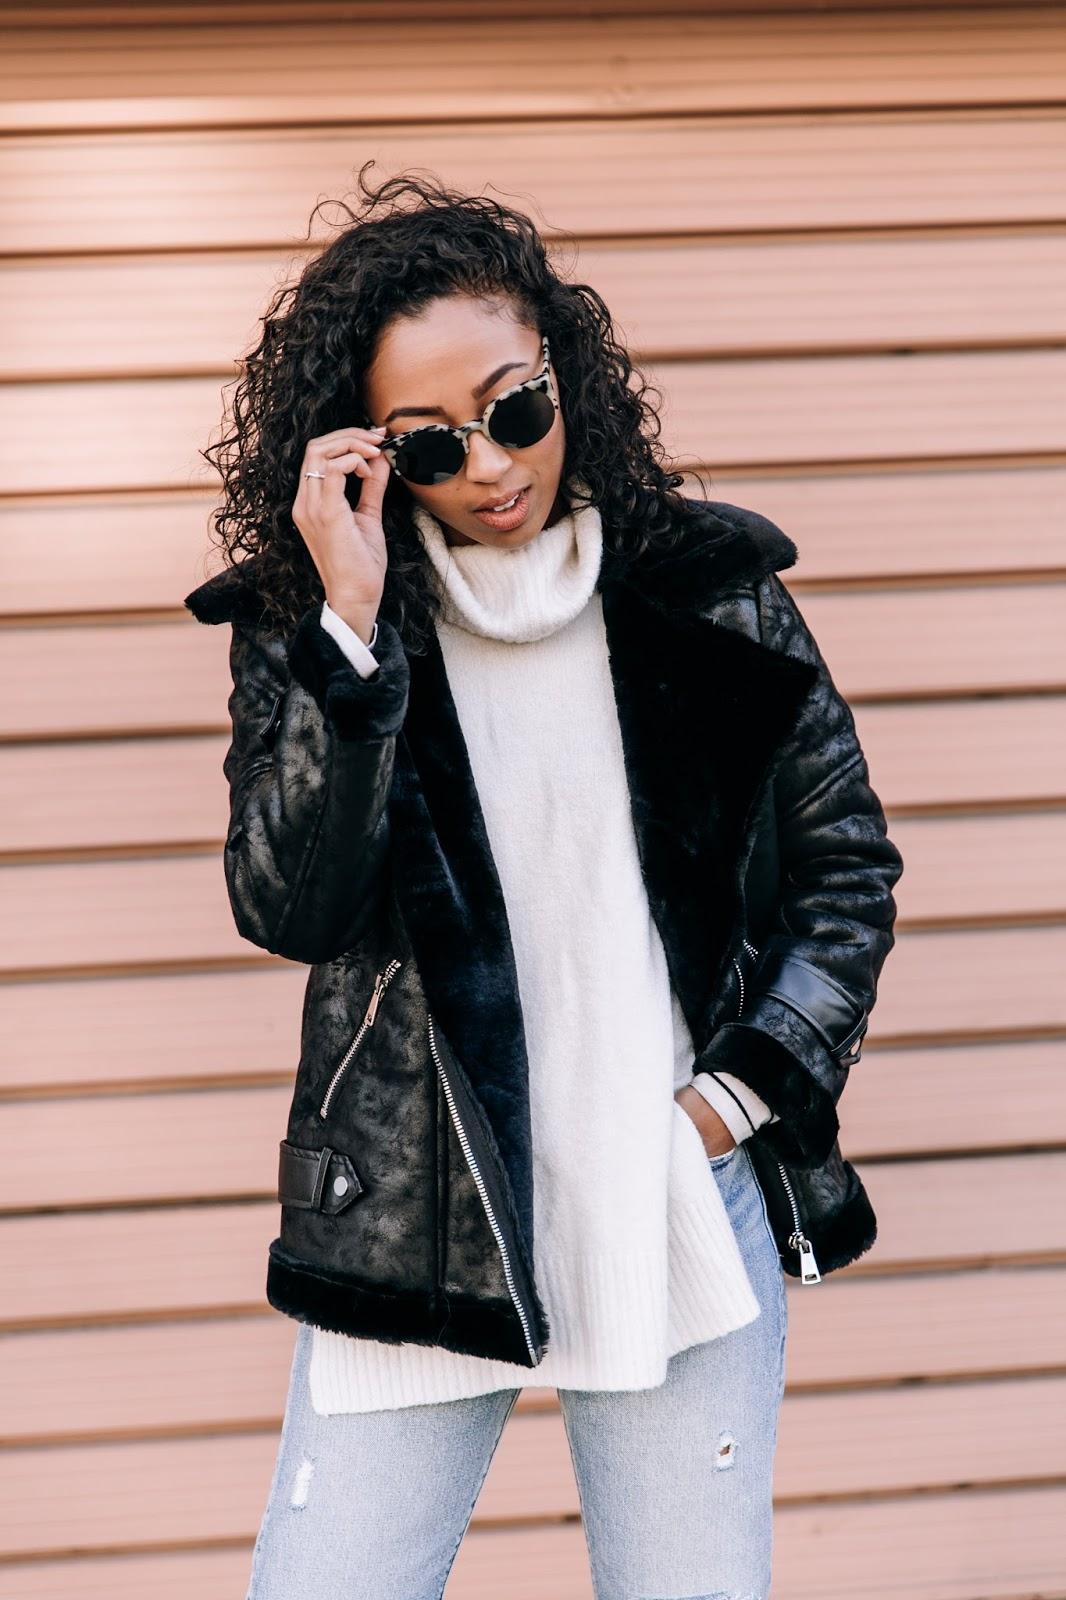 pancakestacker blog; #ootd; outfit; boohoo faux shearling aviator jacket; retro super future sunglasses; Levi's wedgie distressed denim; everlane day heel